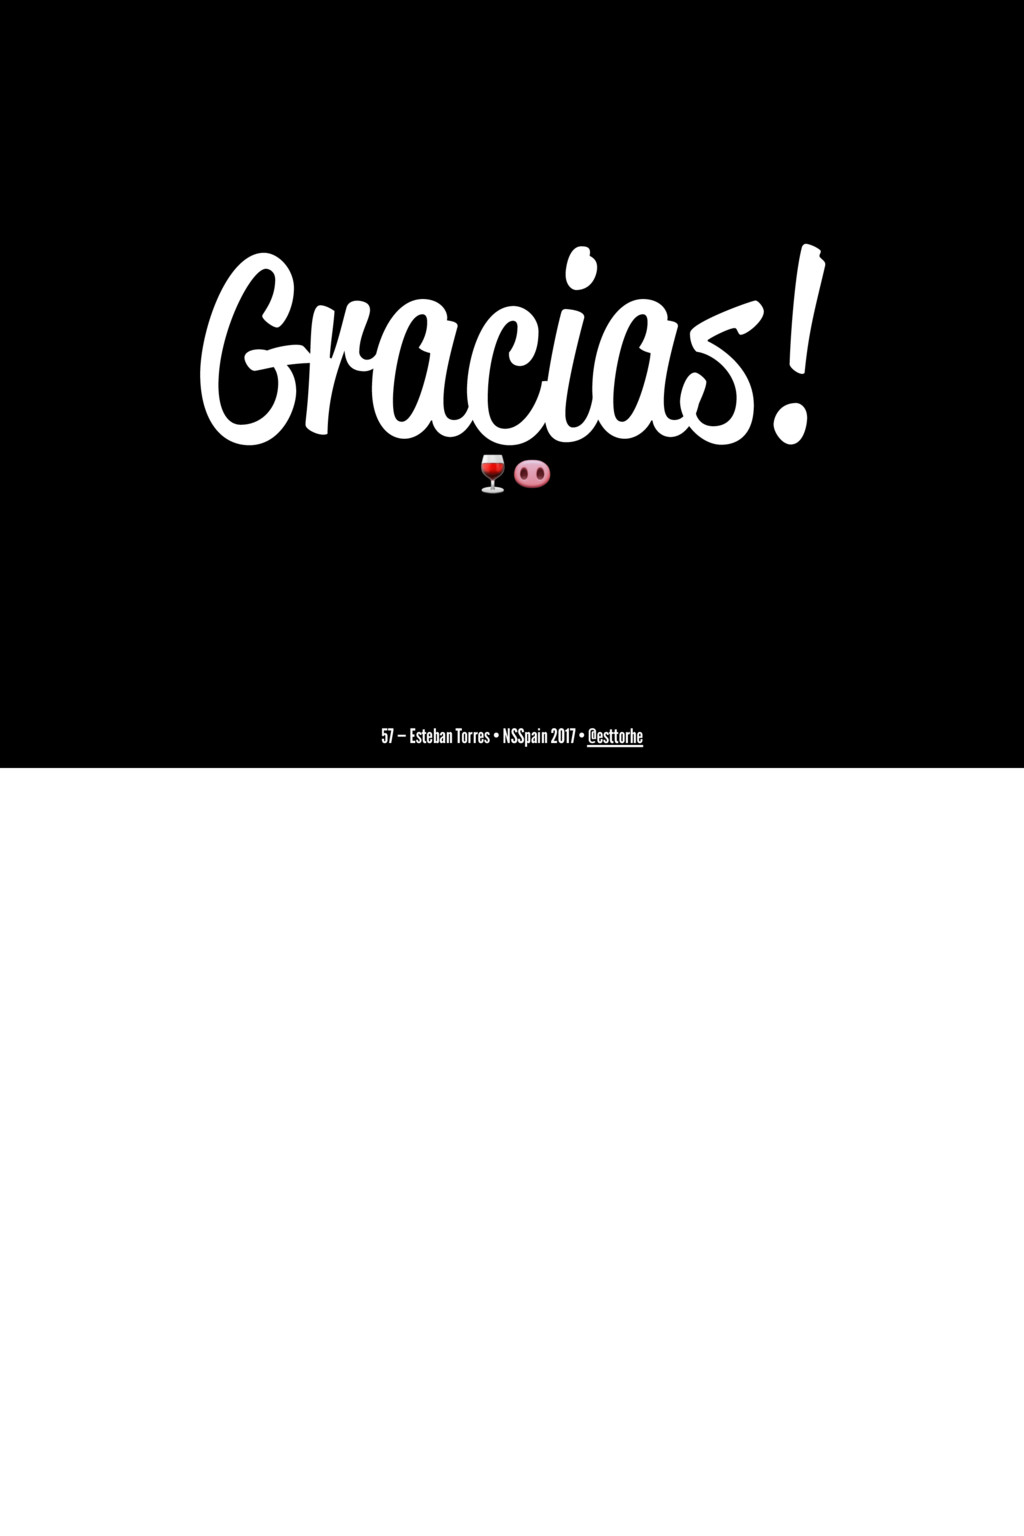 "Gracias! !"" 57 — Esteban Torres • NSSpain 2017 ..."